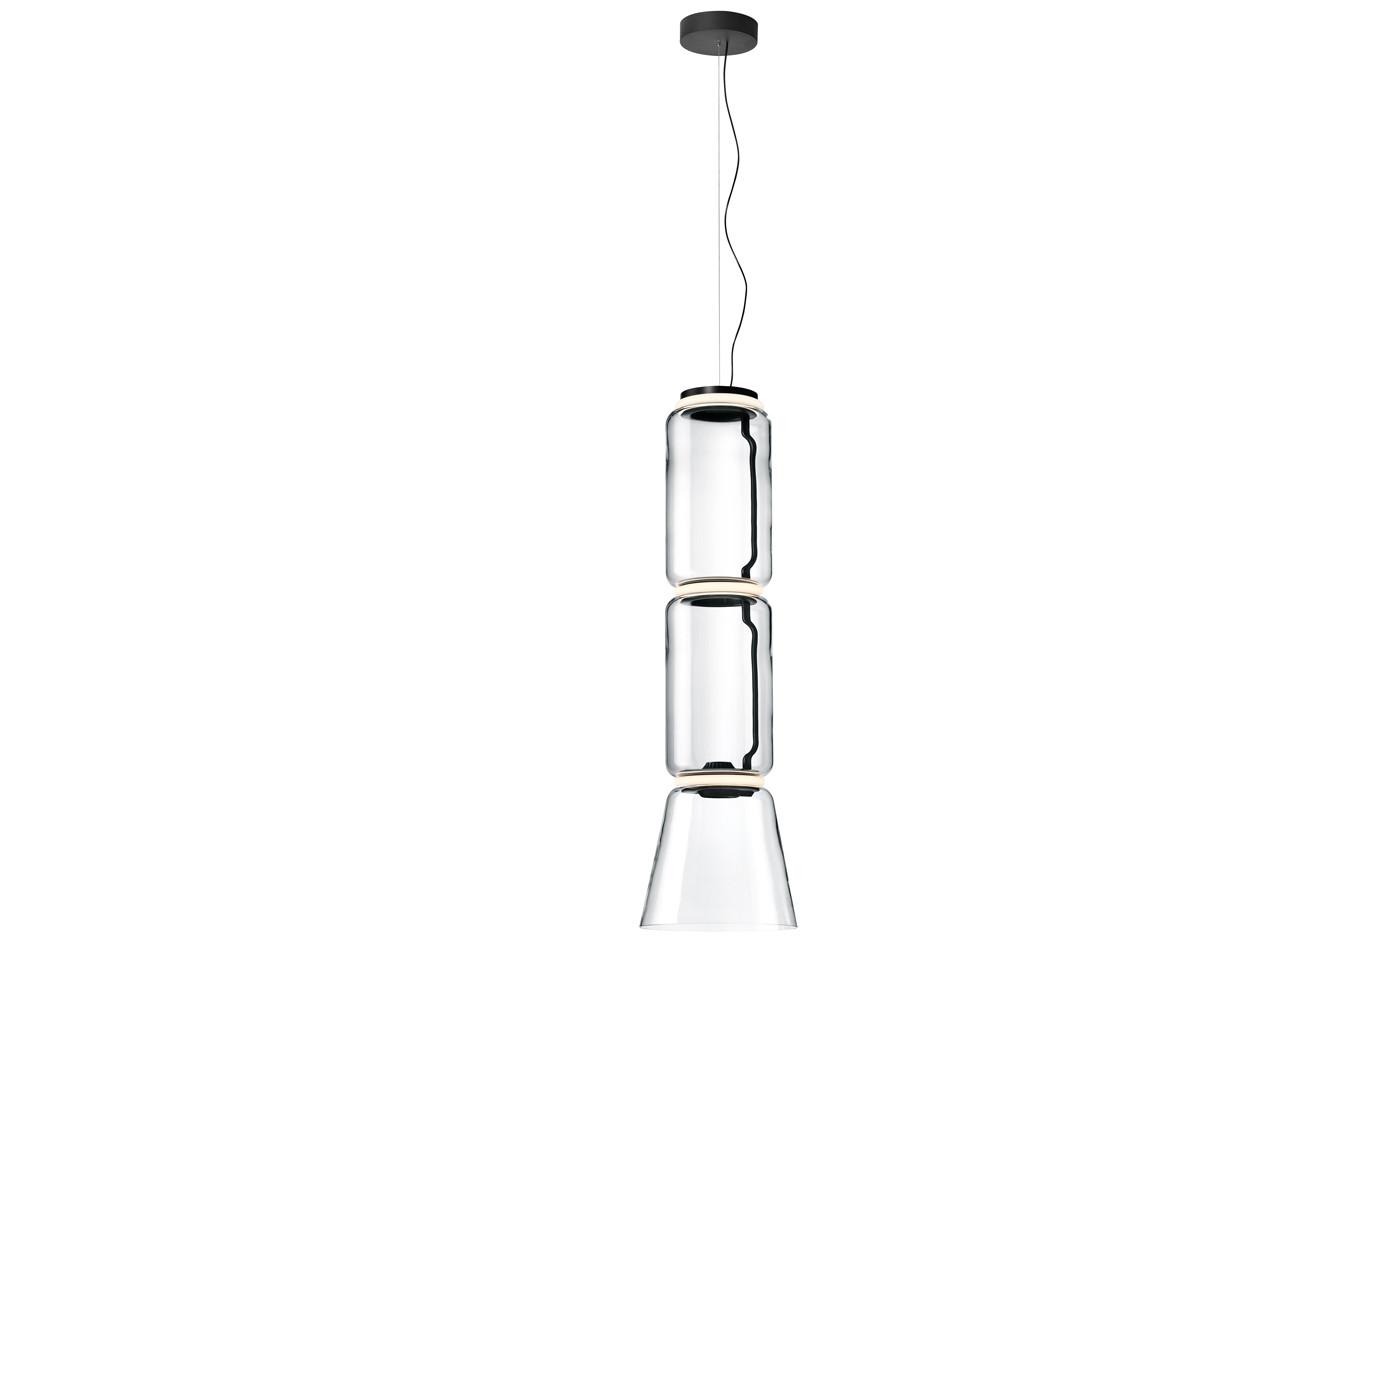 Flos Noctambule Low Cylinders & Cone LED